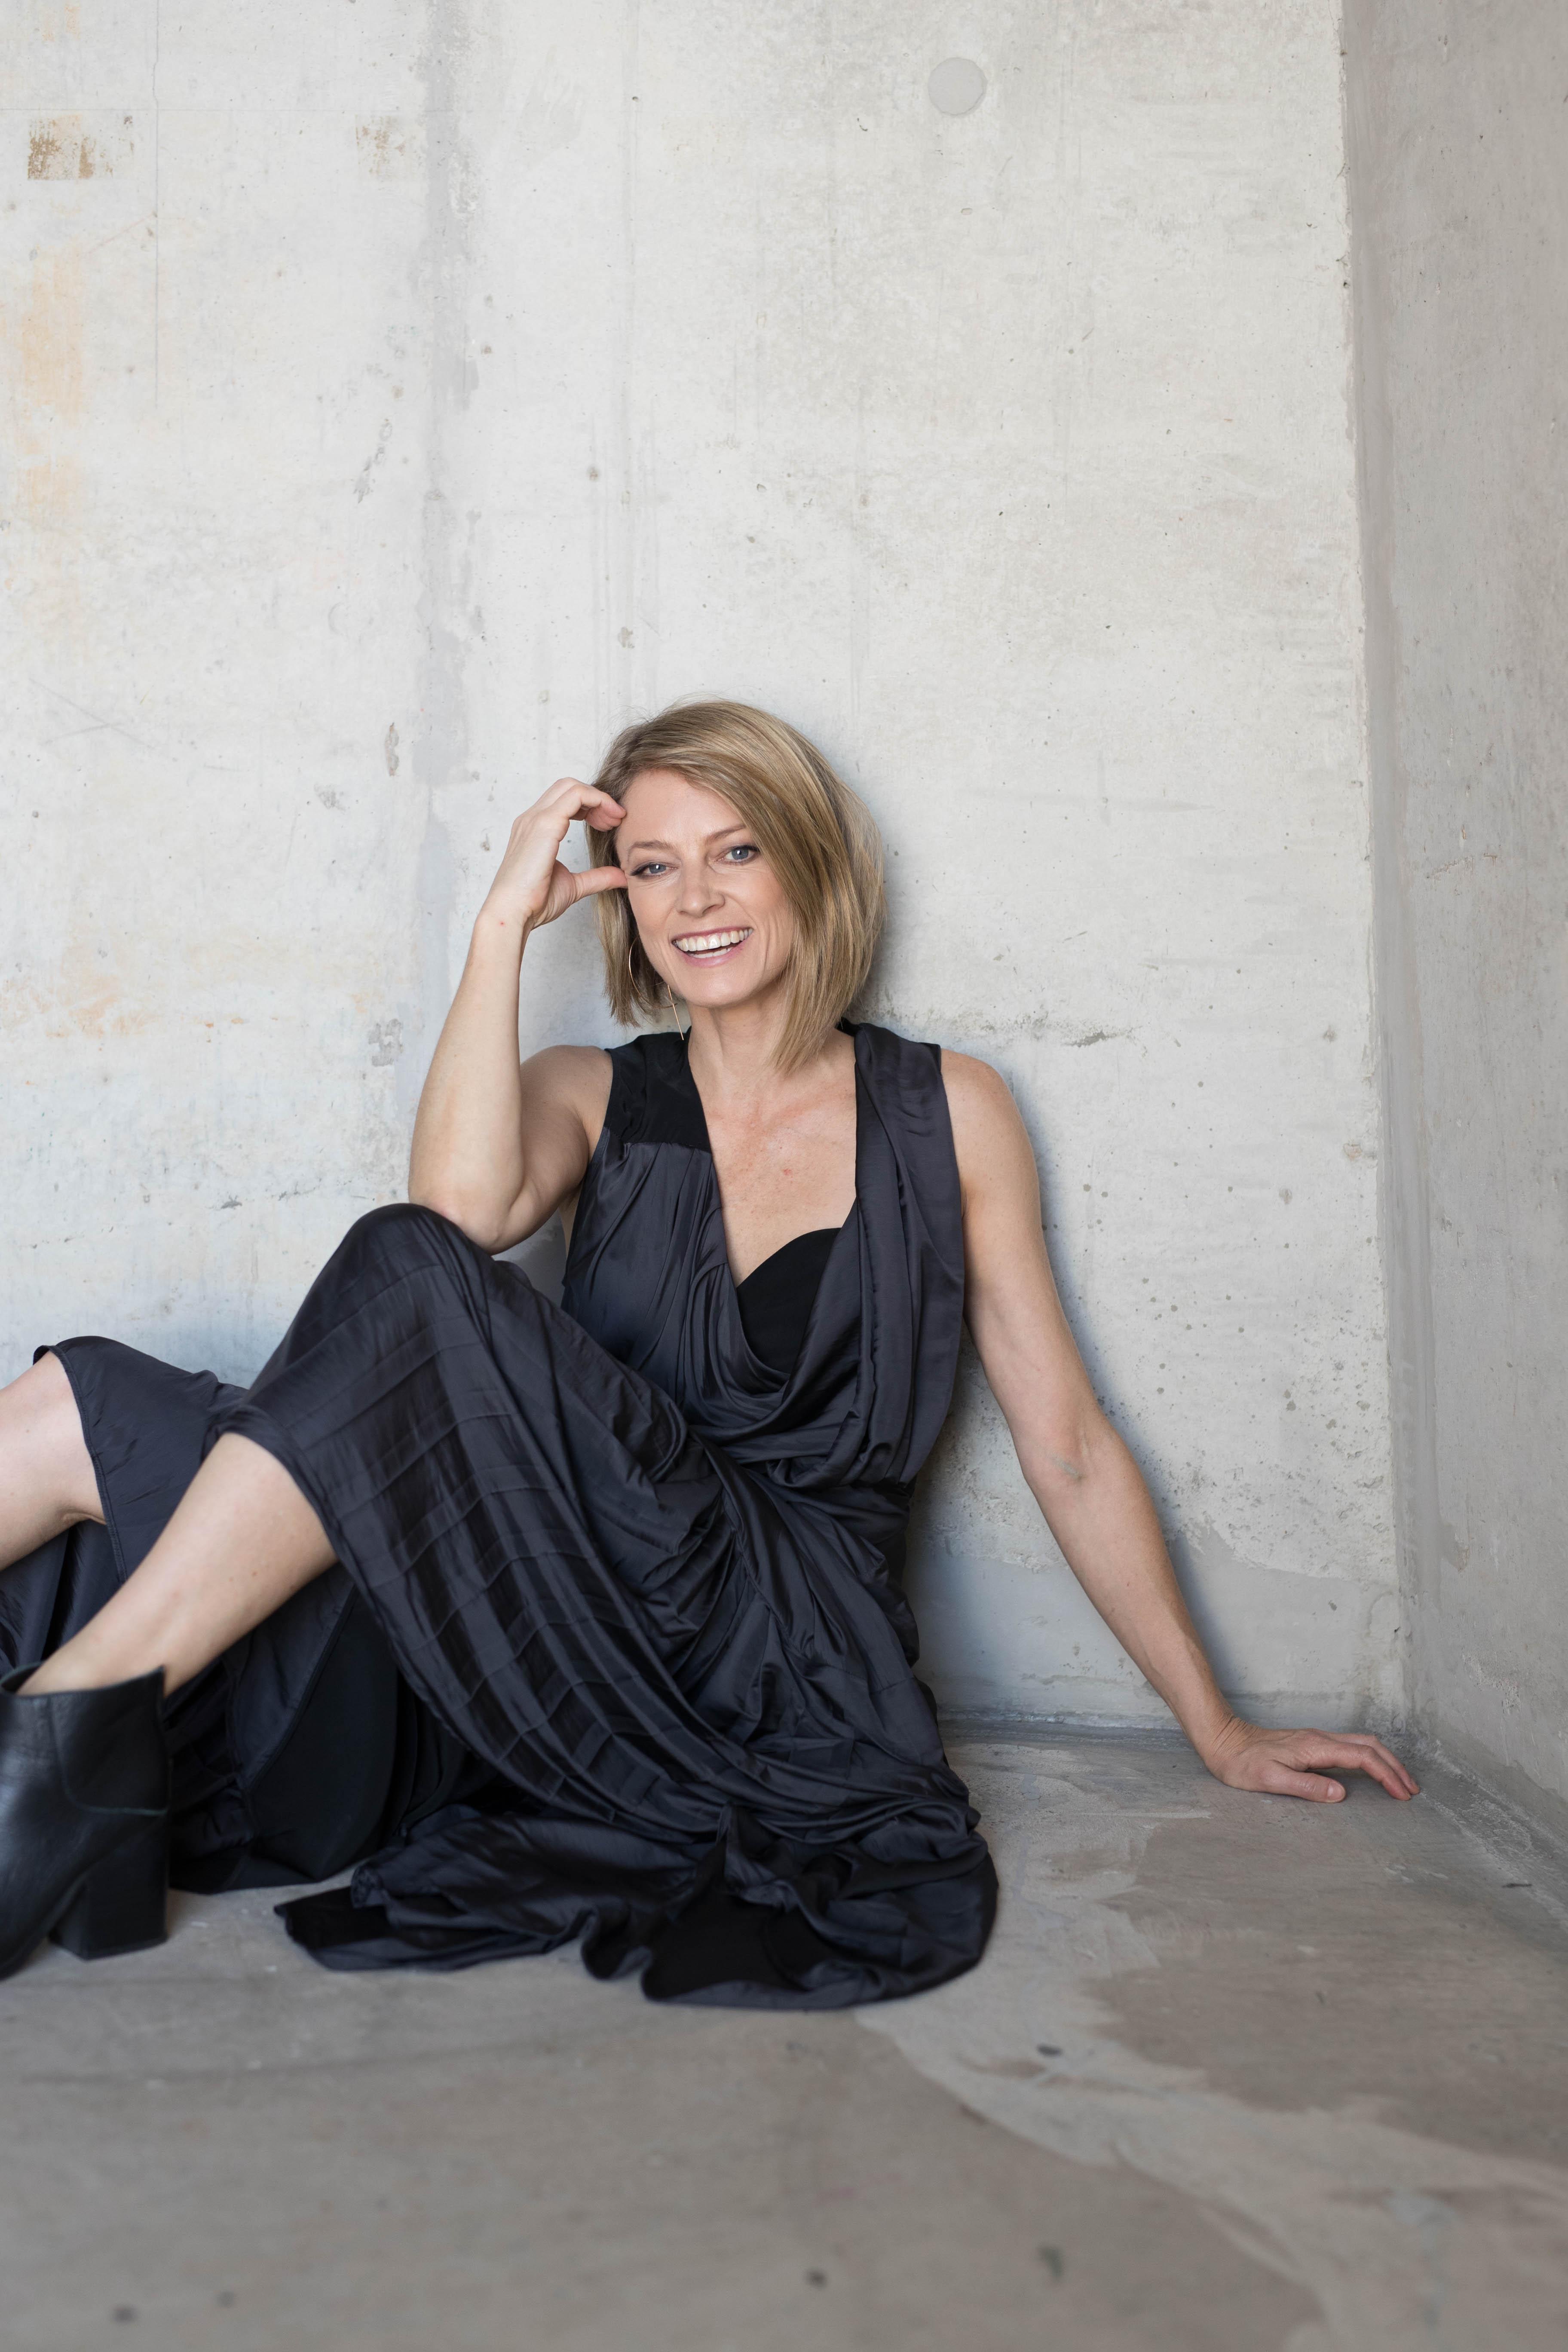 Amy Hollingsworth - Photo By David Kelly